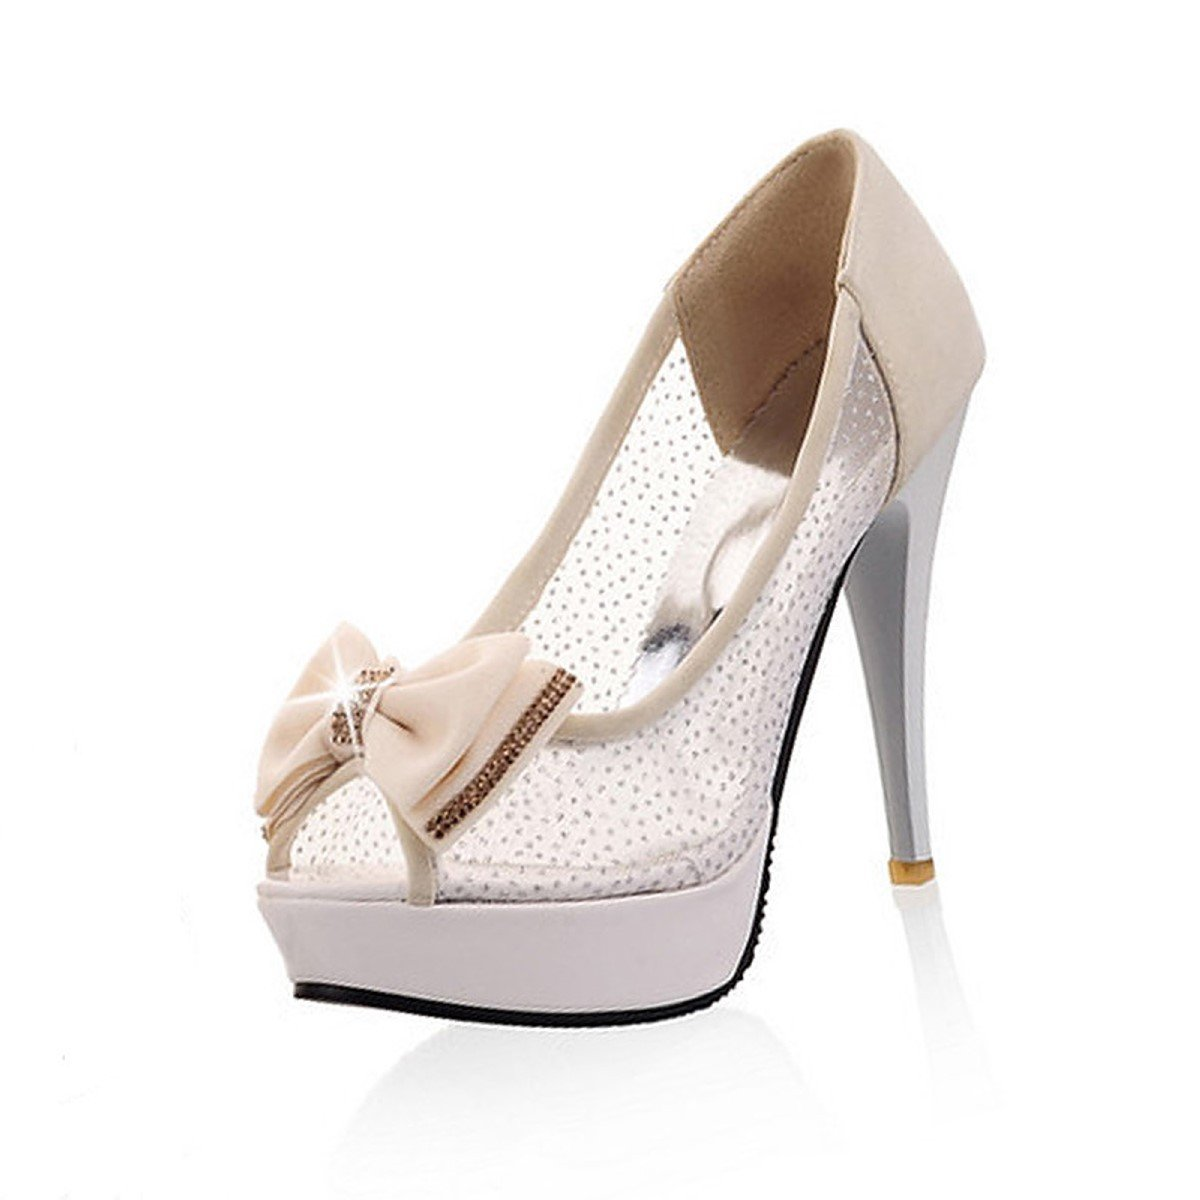 DIMAOL Womens Shoes PU Net Summer Fall Comfort Novelty Heels Stiletto Heel Peep Toe Bowknot for Wedding Party /& Evening Blushing Pink Beige